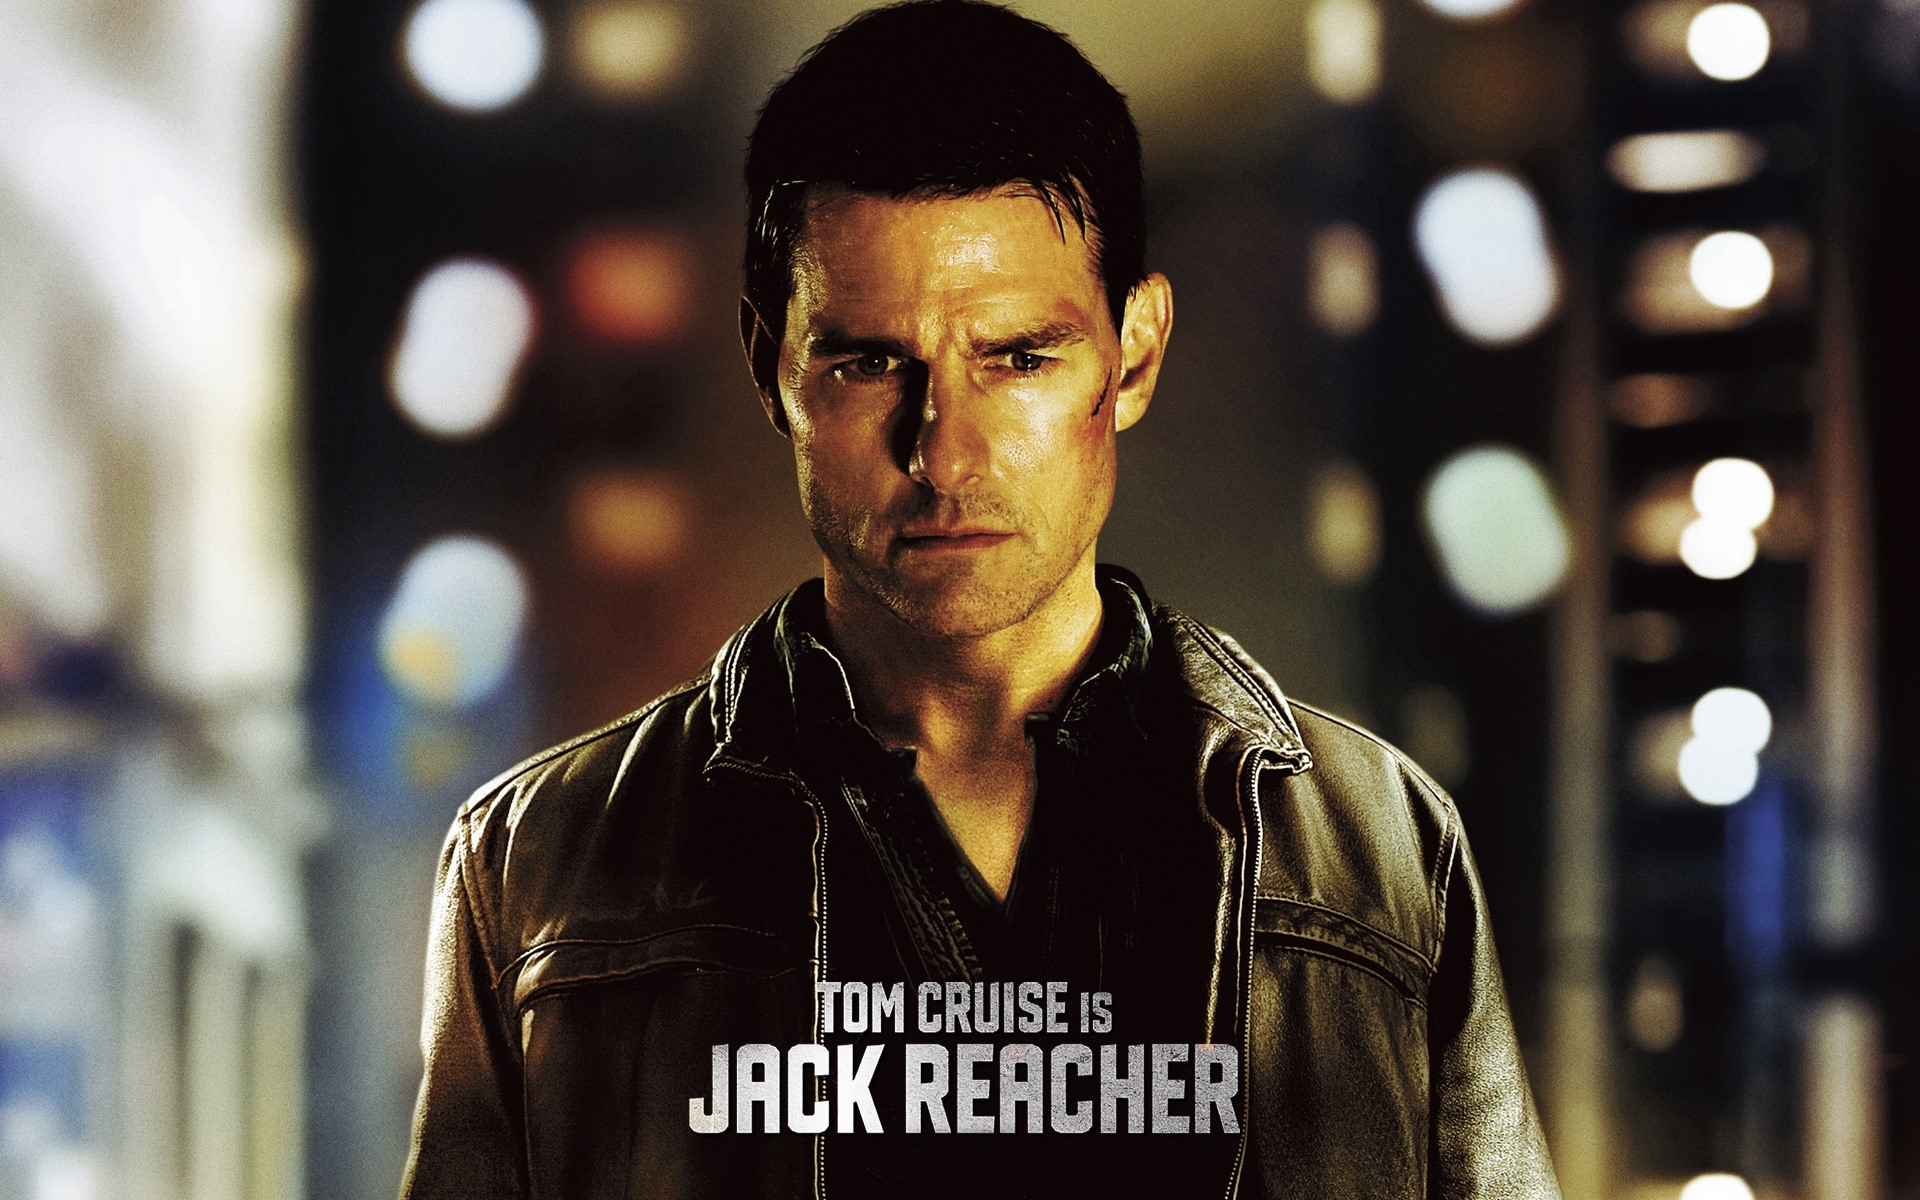 Tom cruise in Jack Reacher Wallpaper Full HD ID967 1920x1200